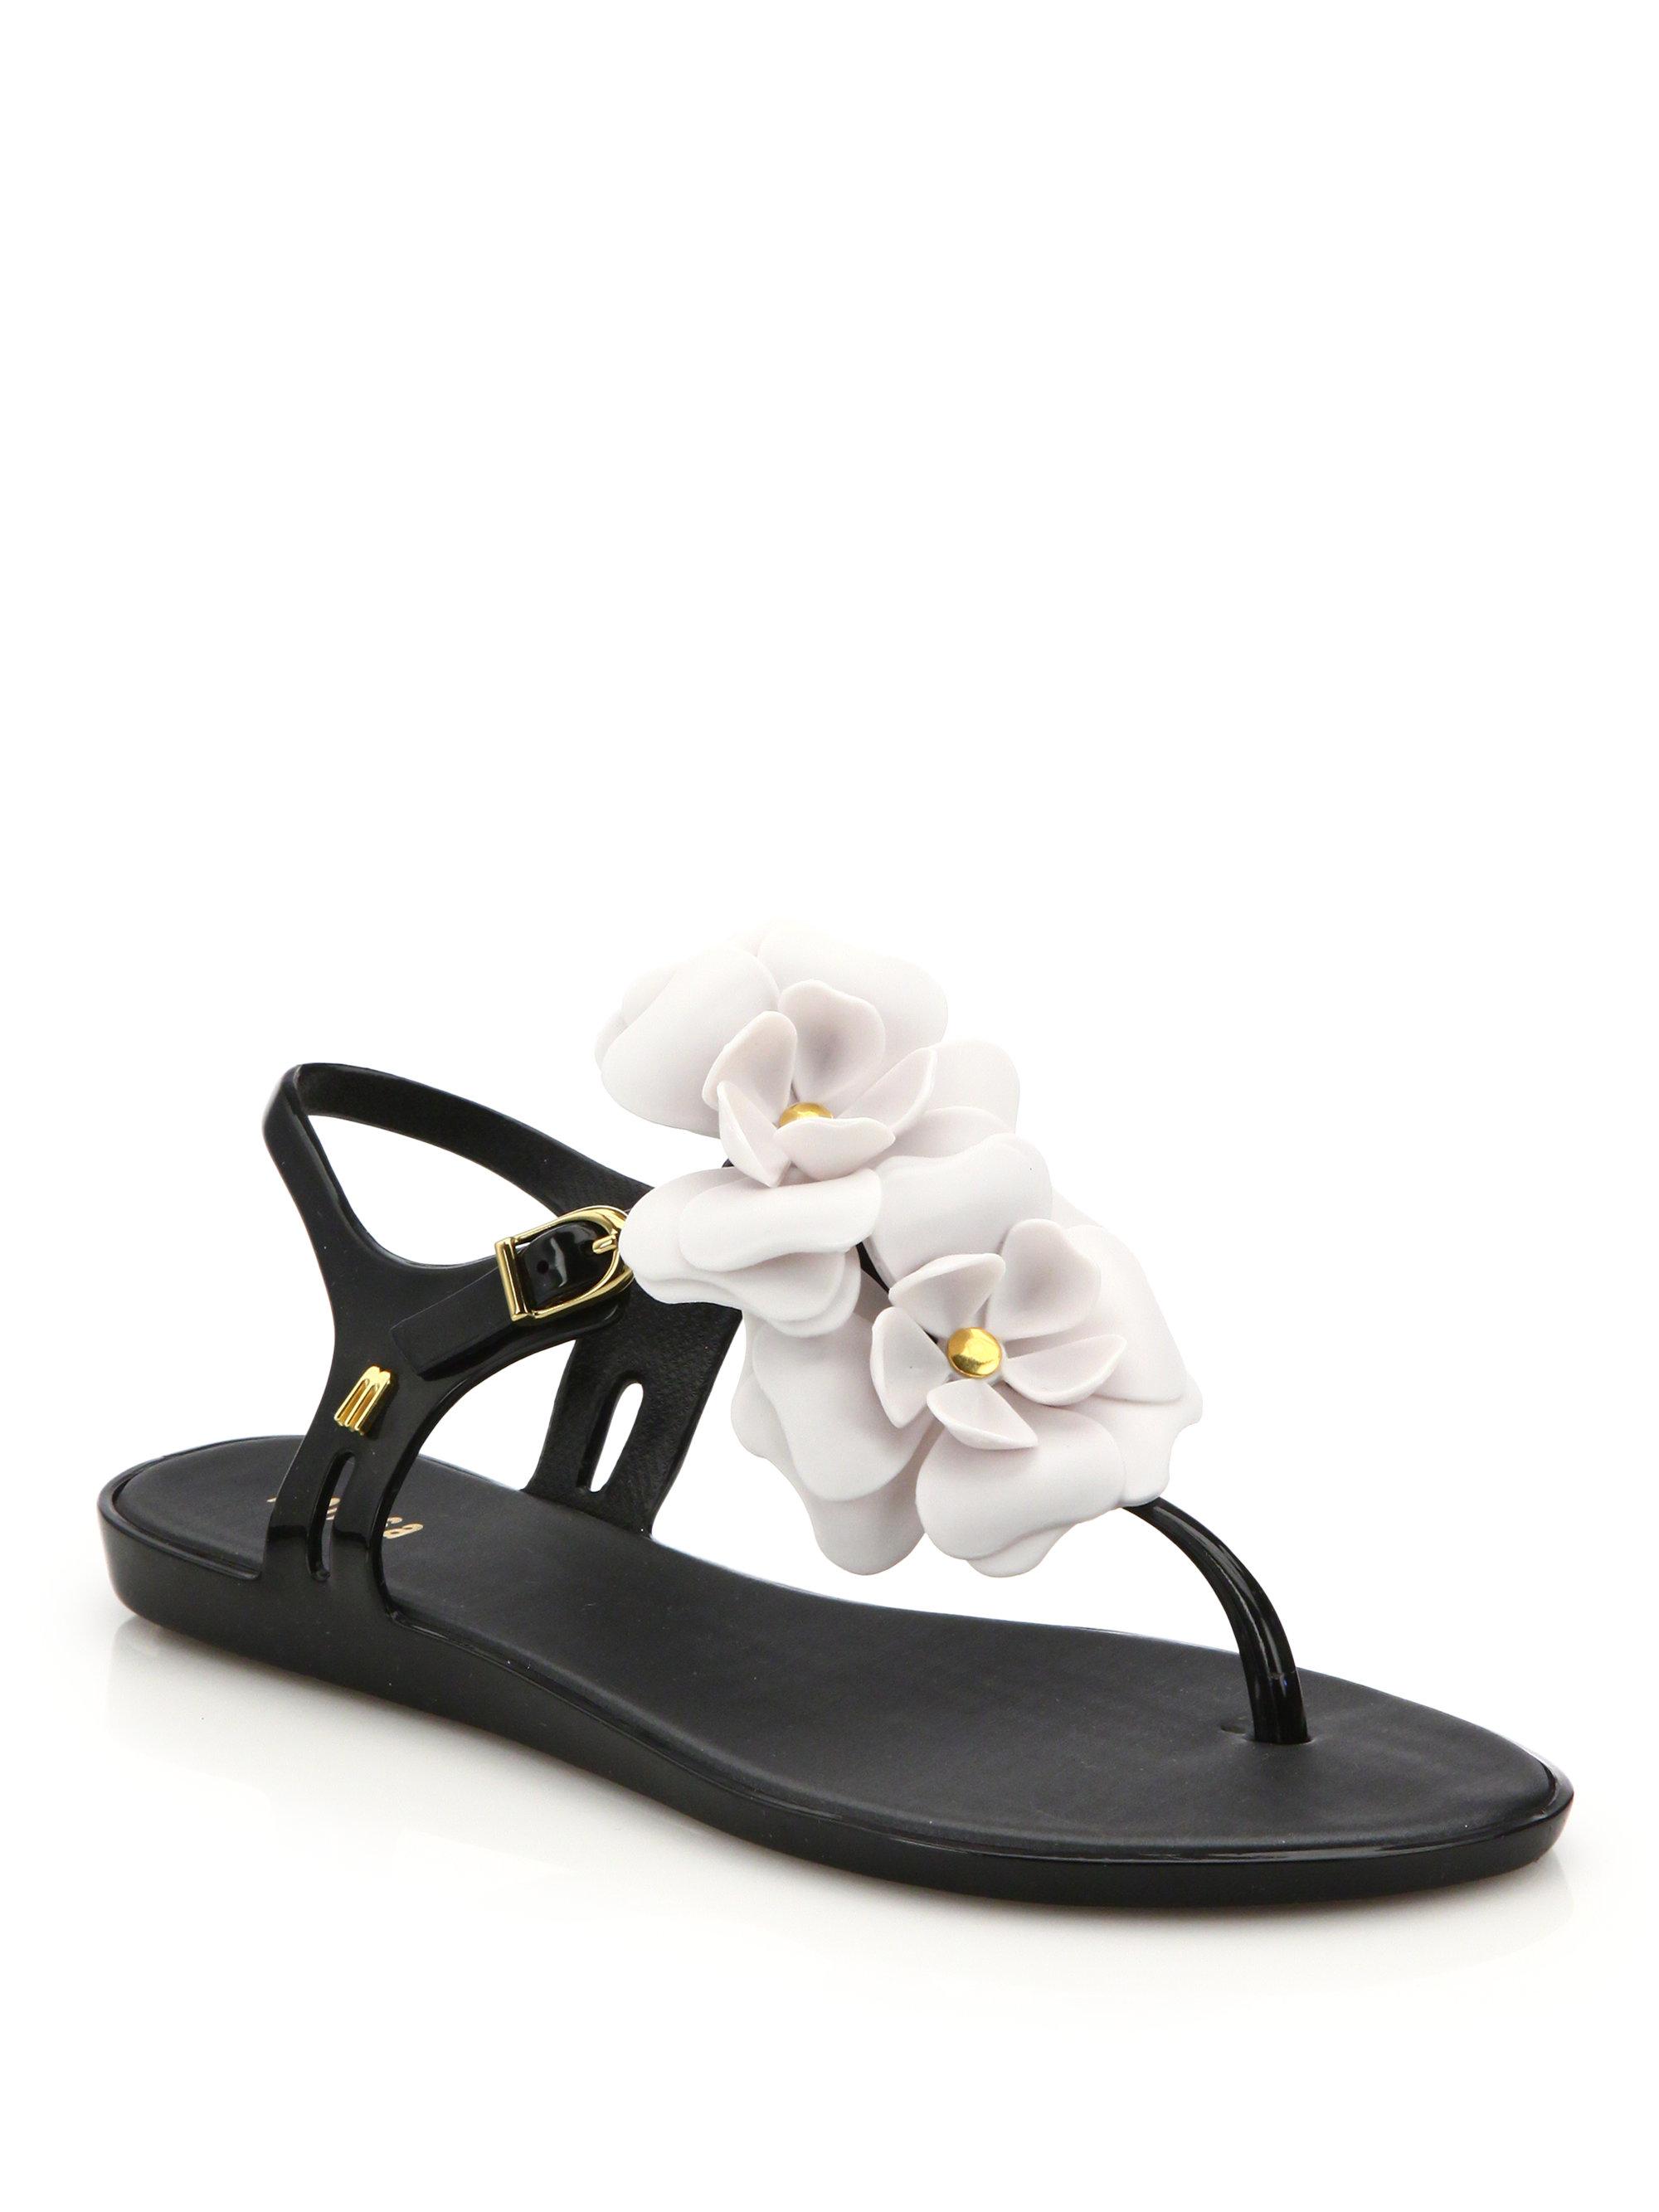 6024730dc61d Lyst - Melissa Solar Garden Ii Rose Sandals in Black